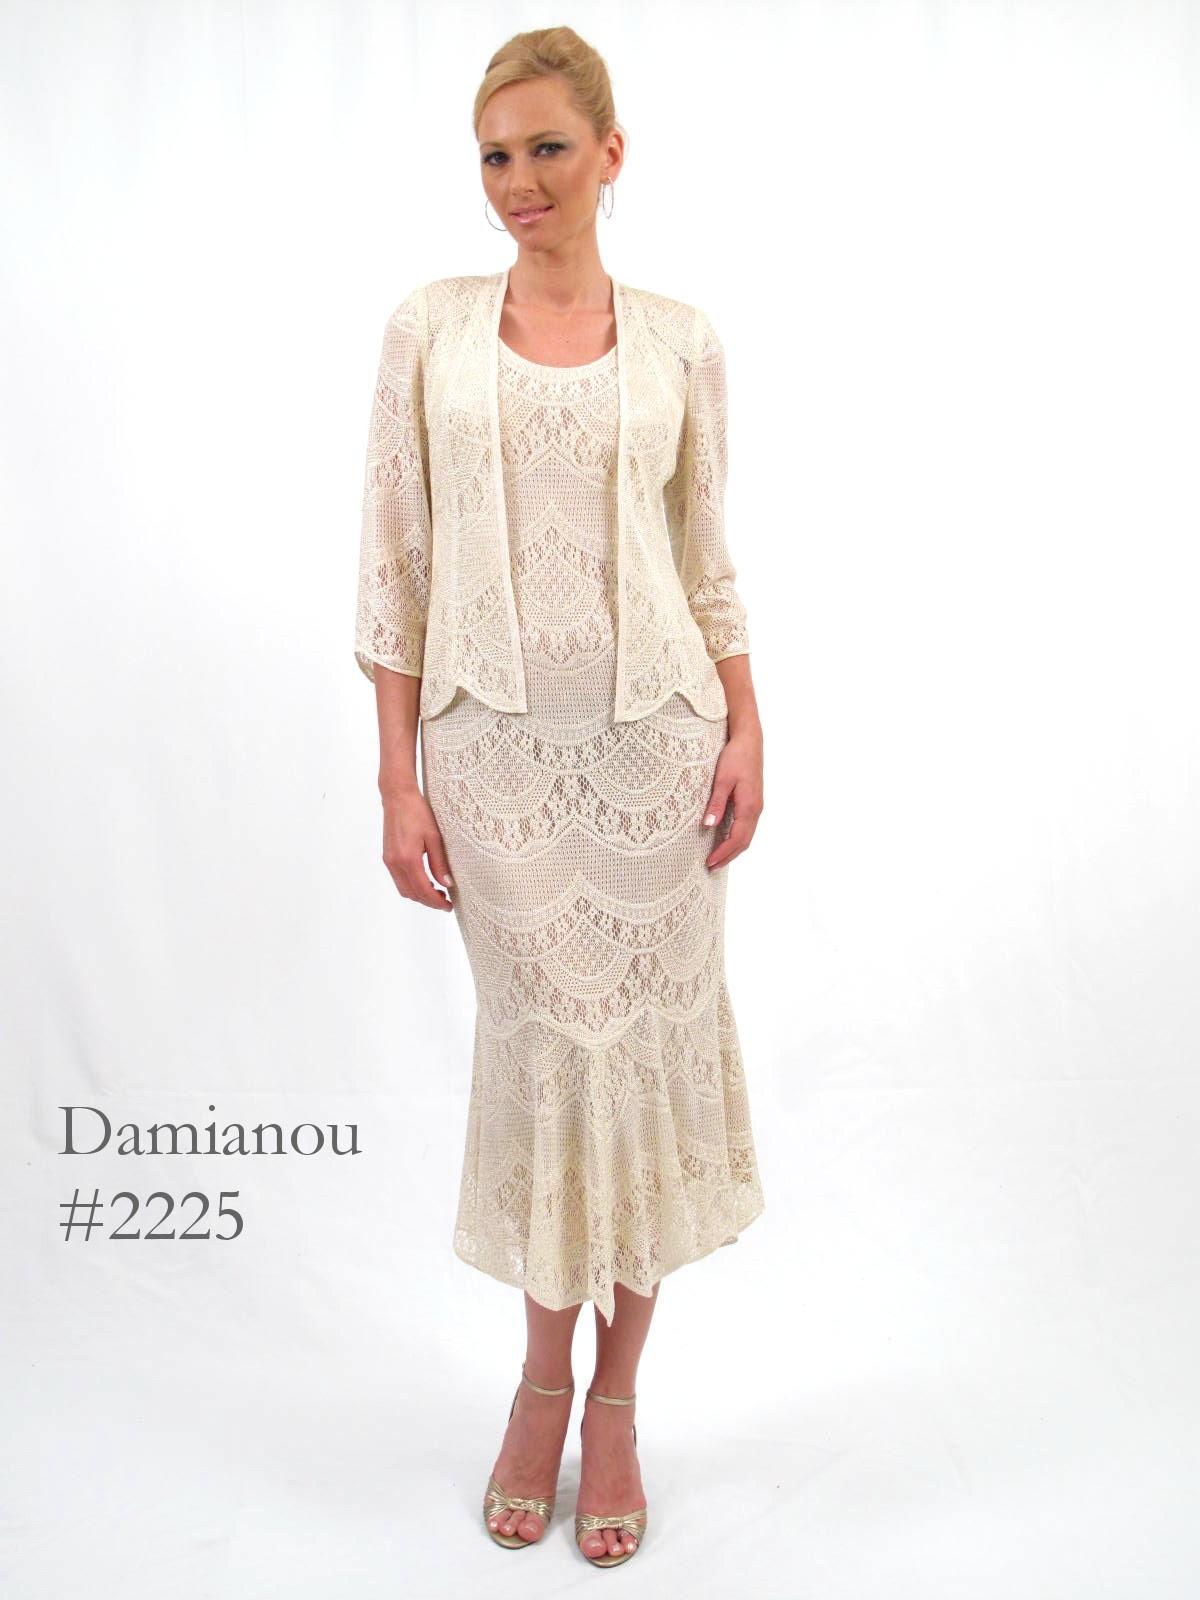 Outdoor Wedding Dresses For Mother Of The Groom,Sample Sale Wedding Dresses Online